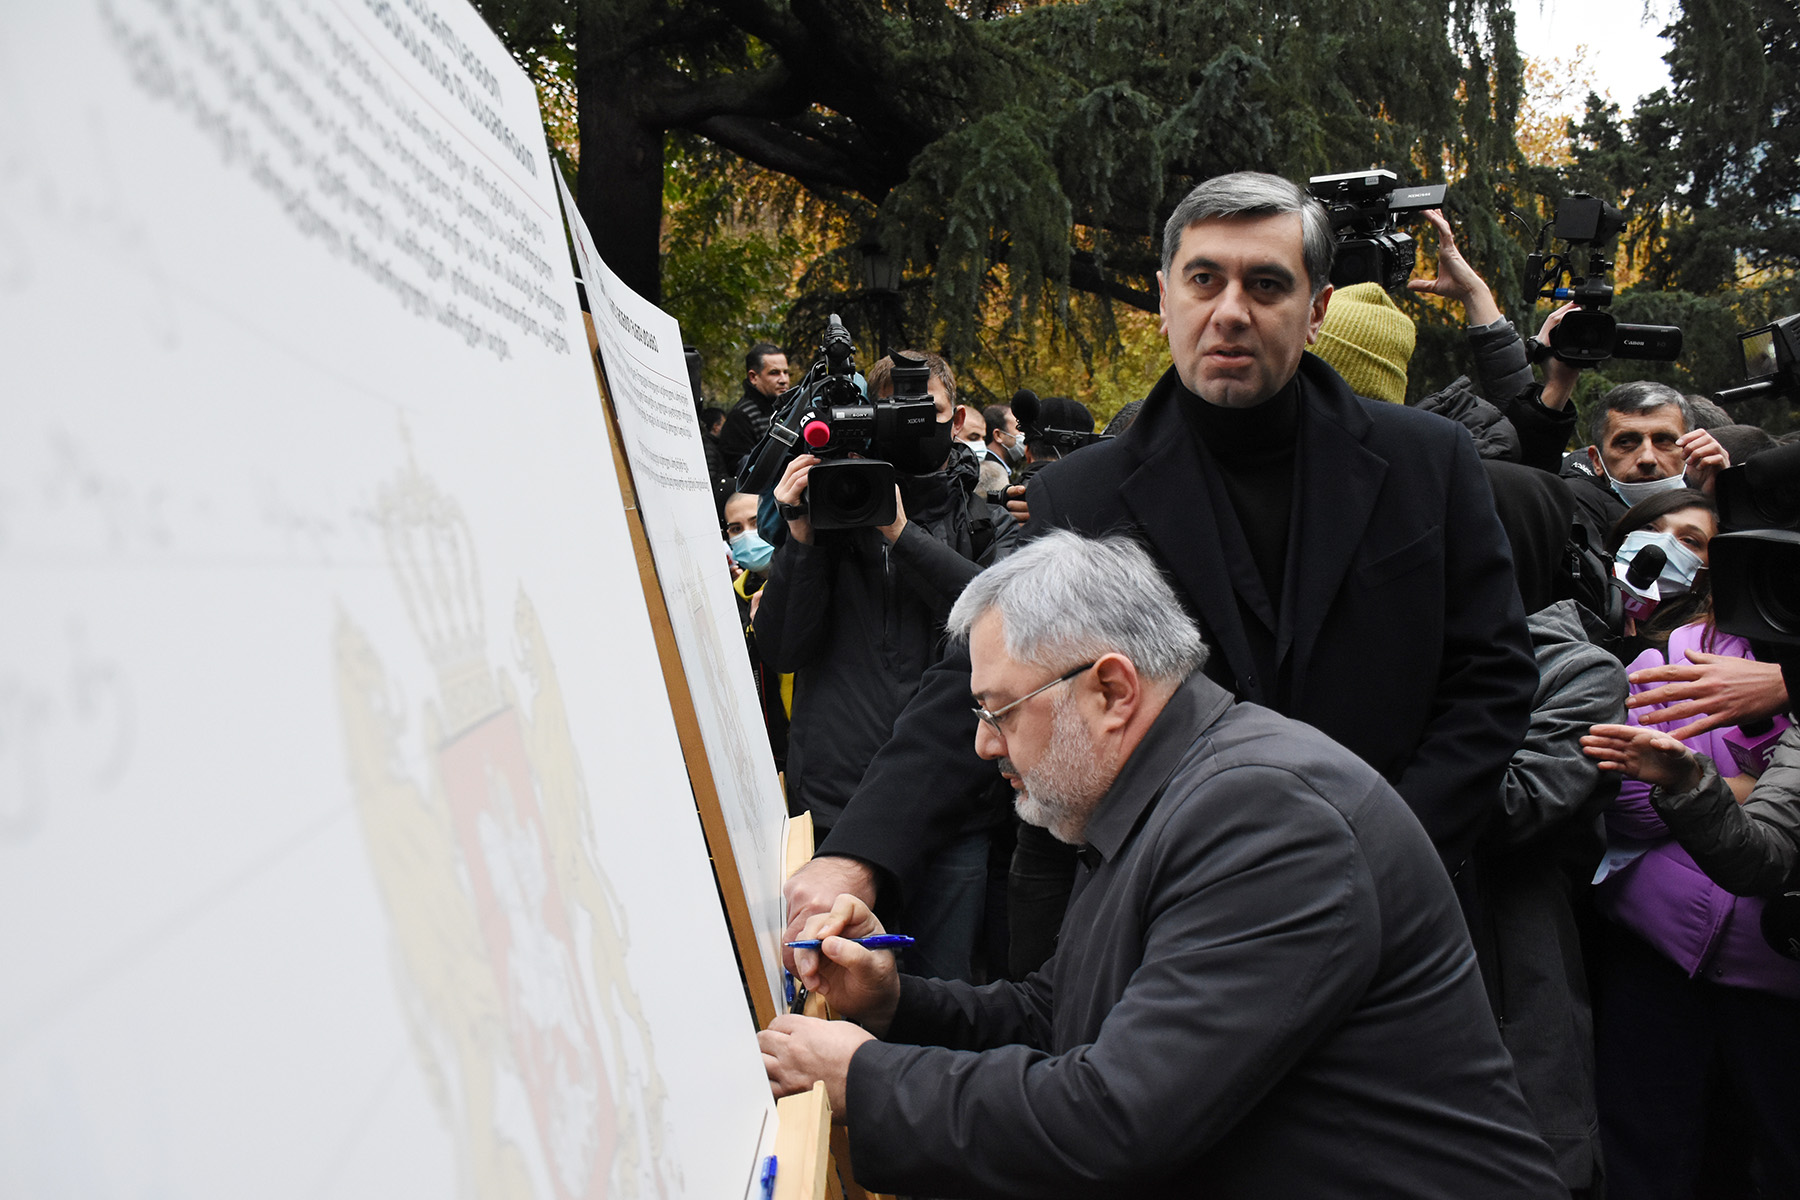 Давид Усупашвили и Иракли Окруашвили подписывают меморандум. Фото: Мариам Никурадзе / OC Media.